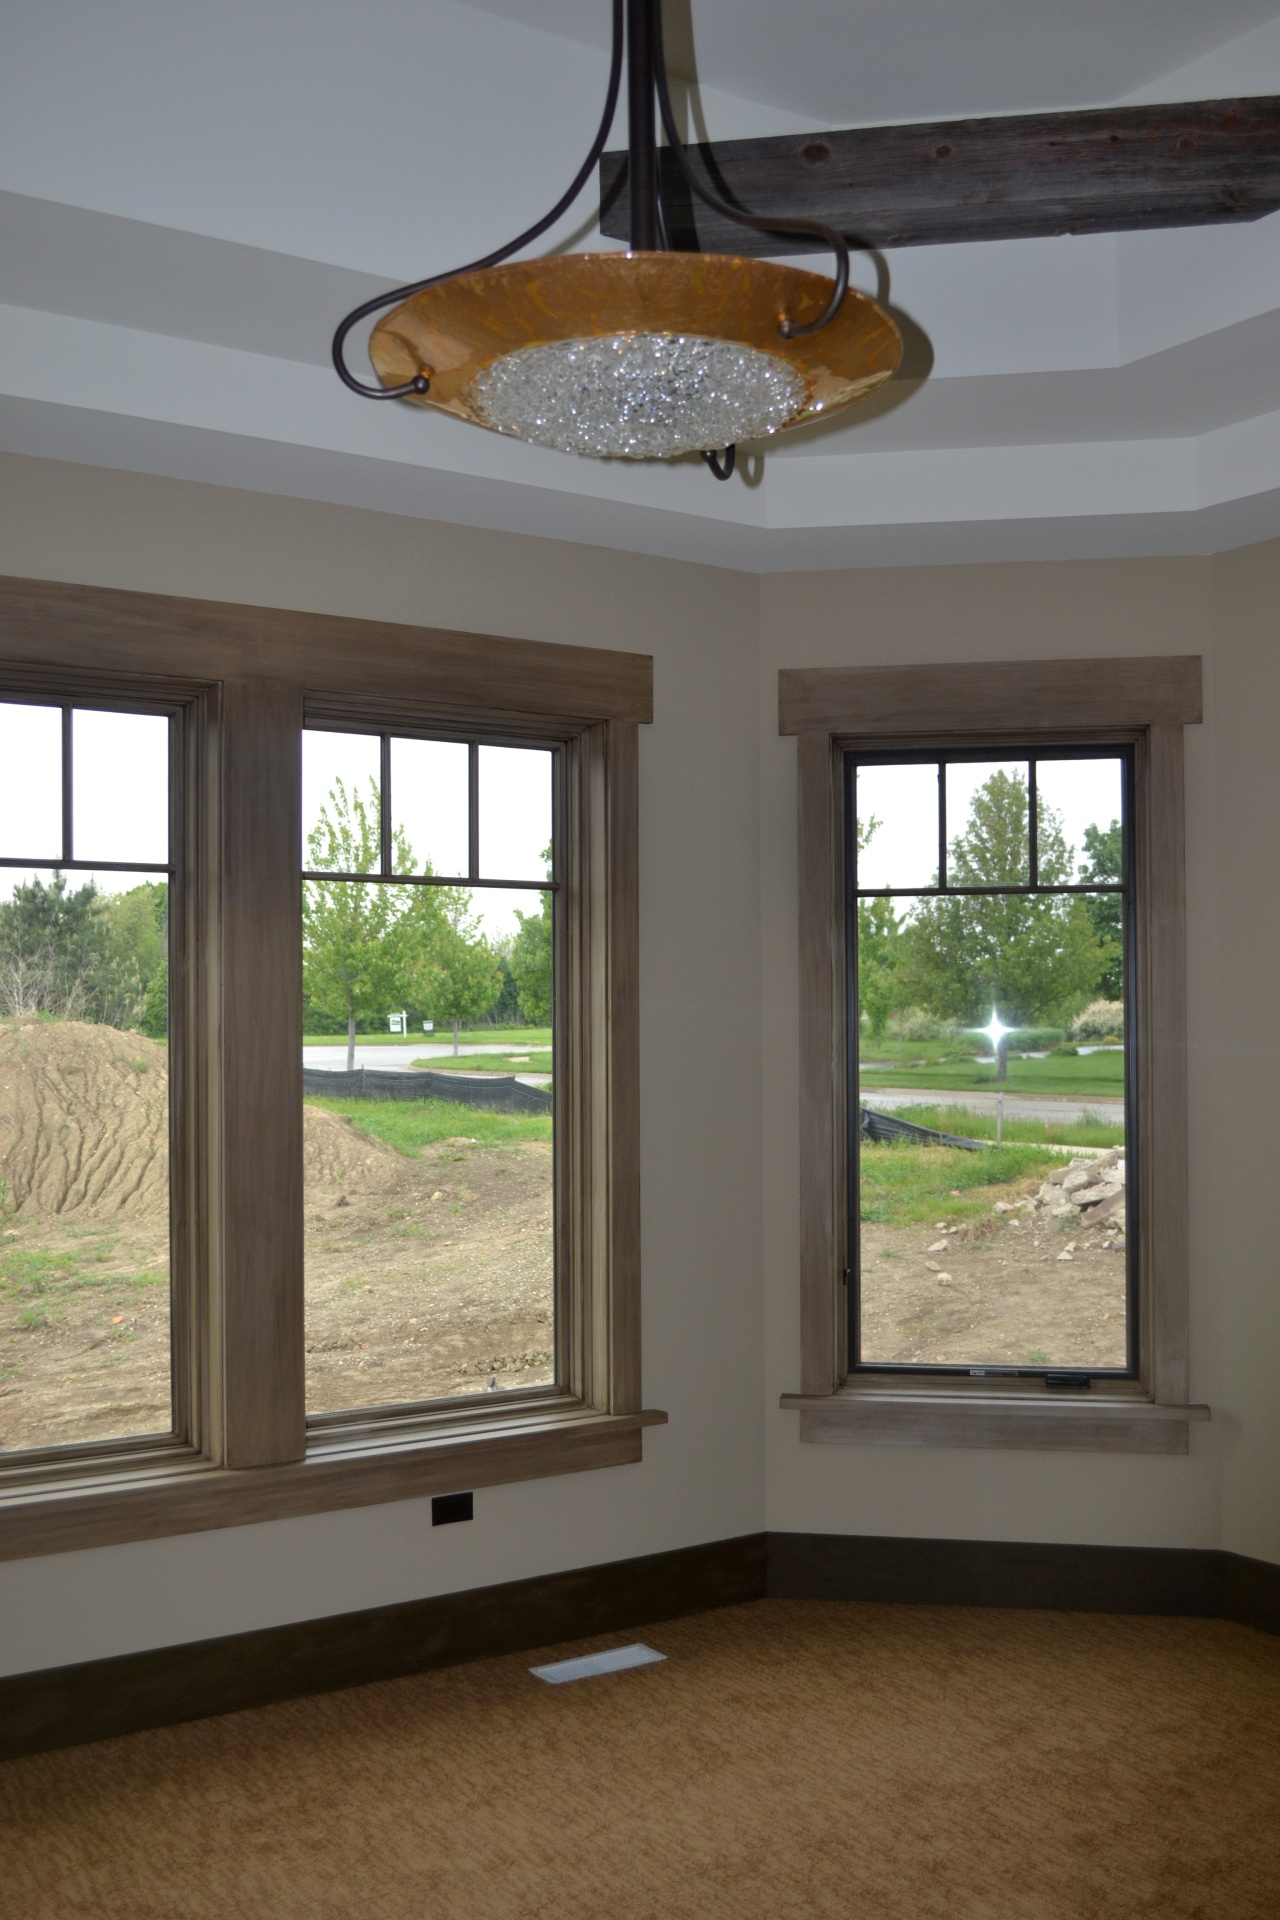 refinished window trims